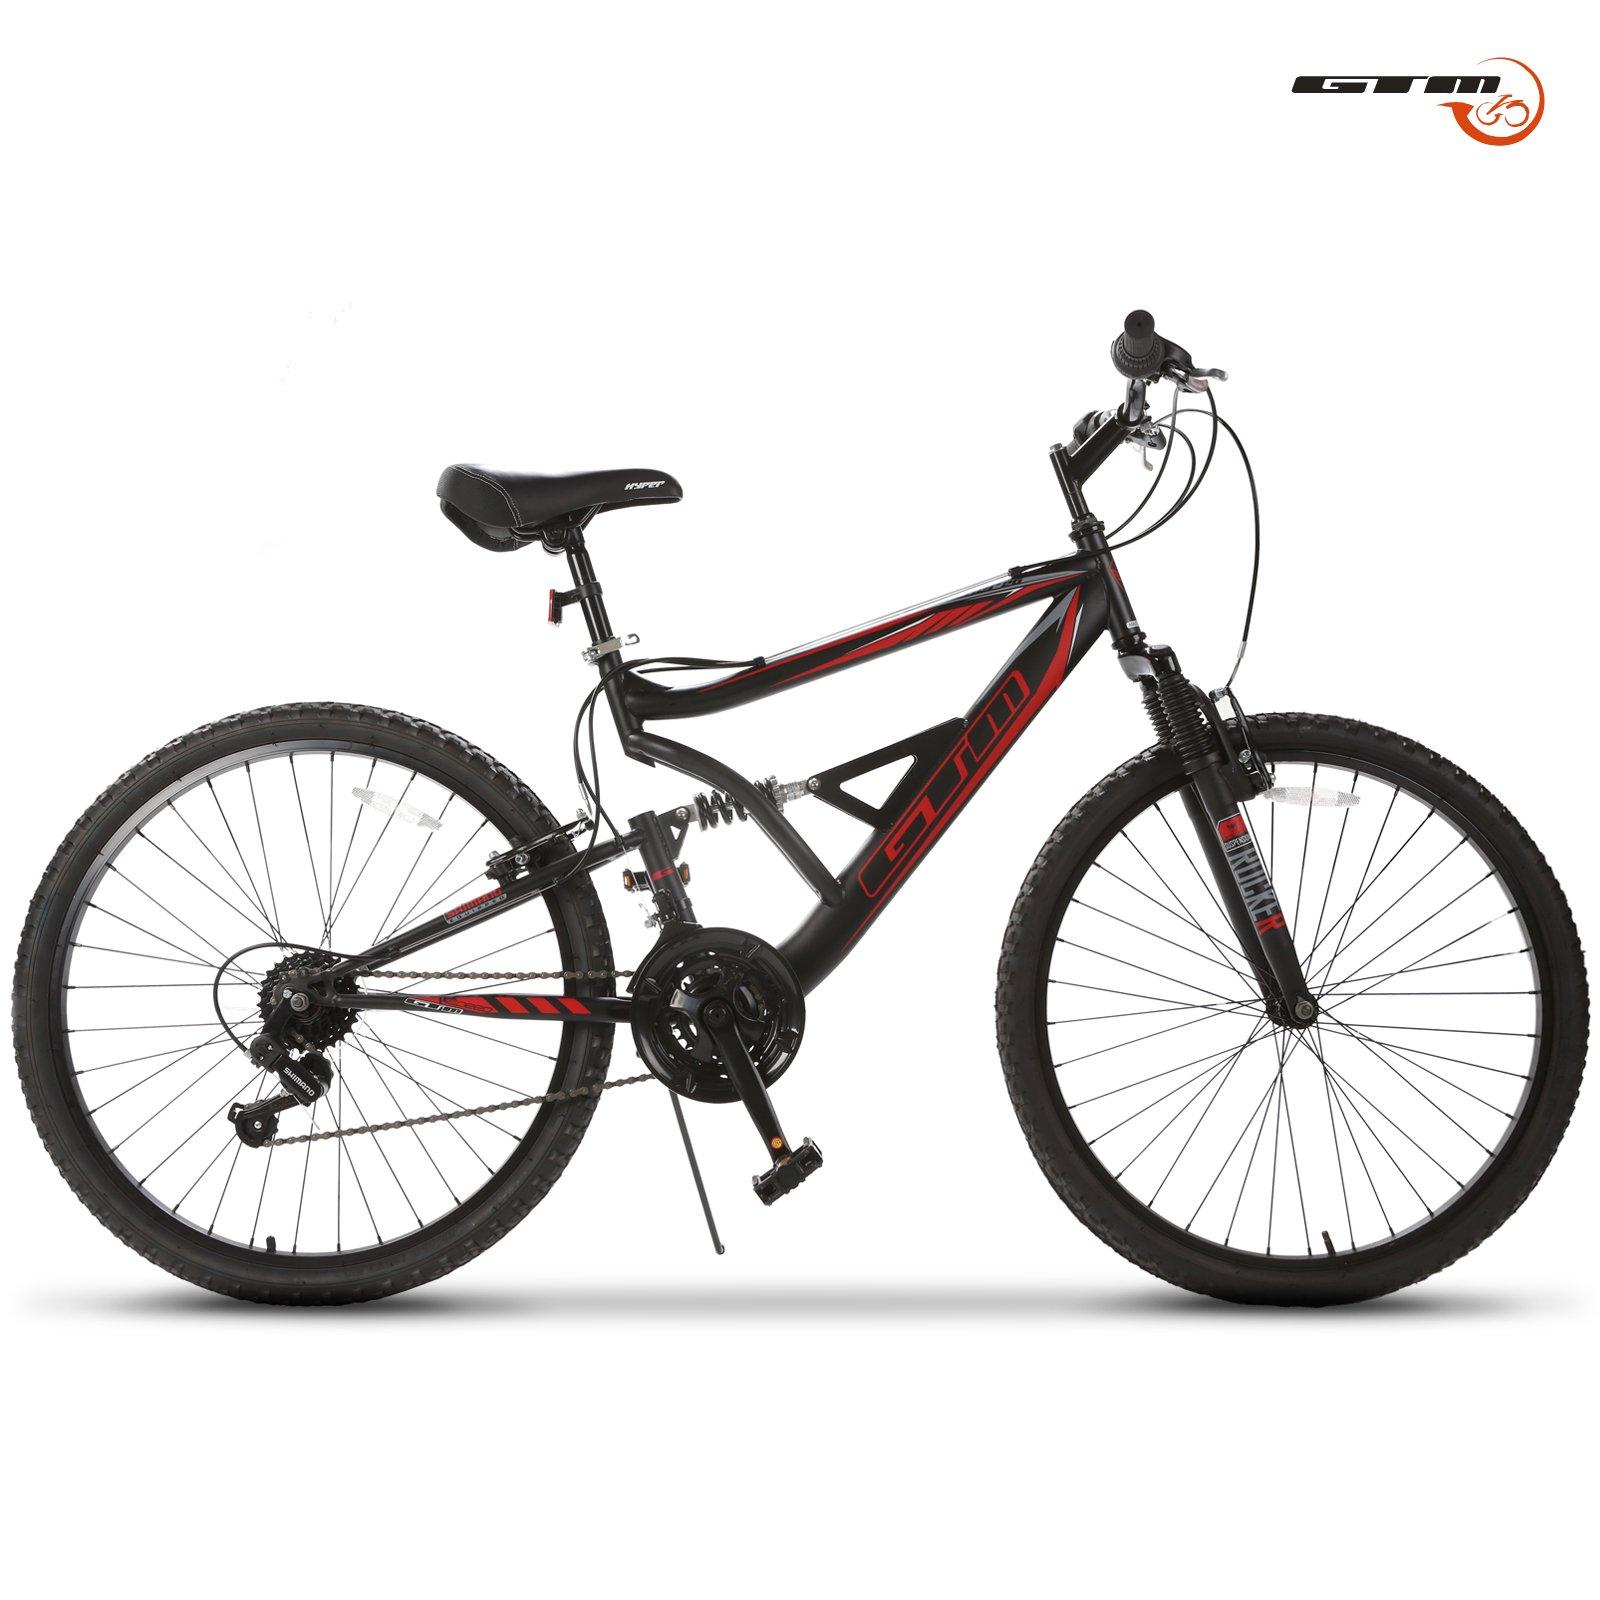 GTM 26'' Mountain Bike 18 Speed Bicycle Shimano Hybrid Suspension,Black&Red